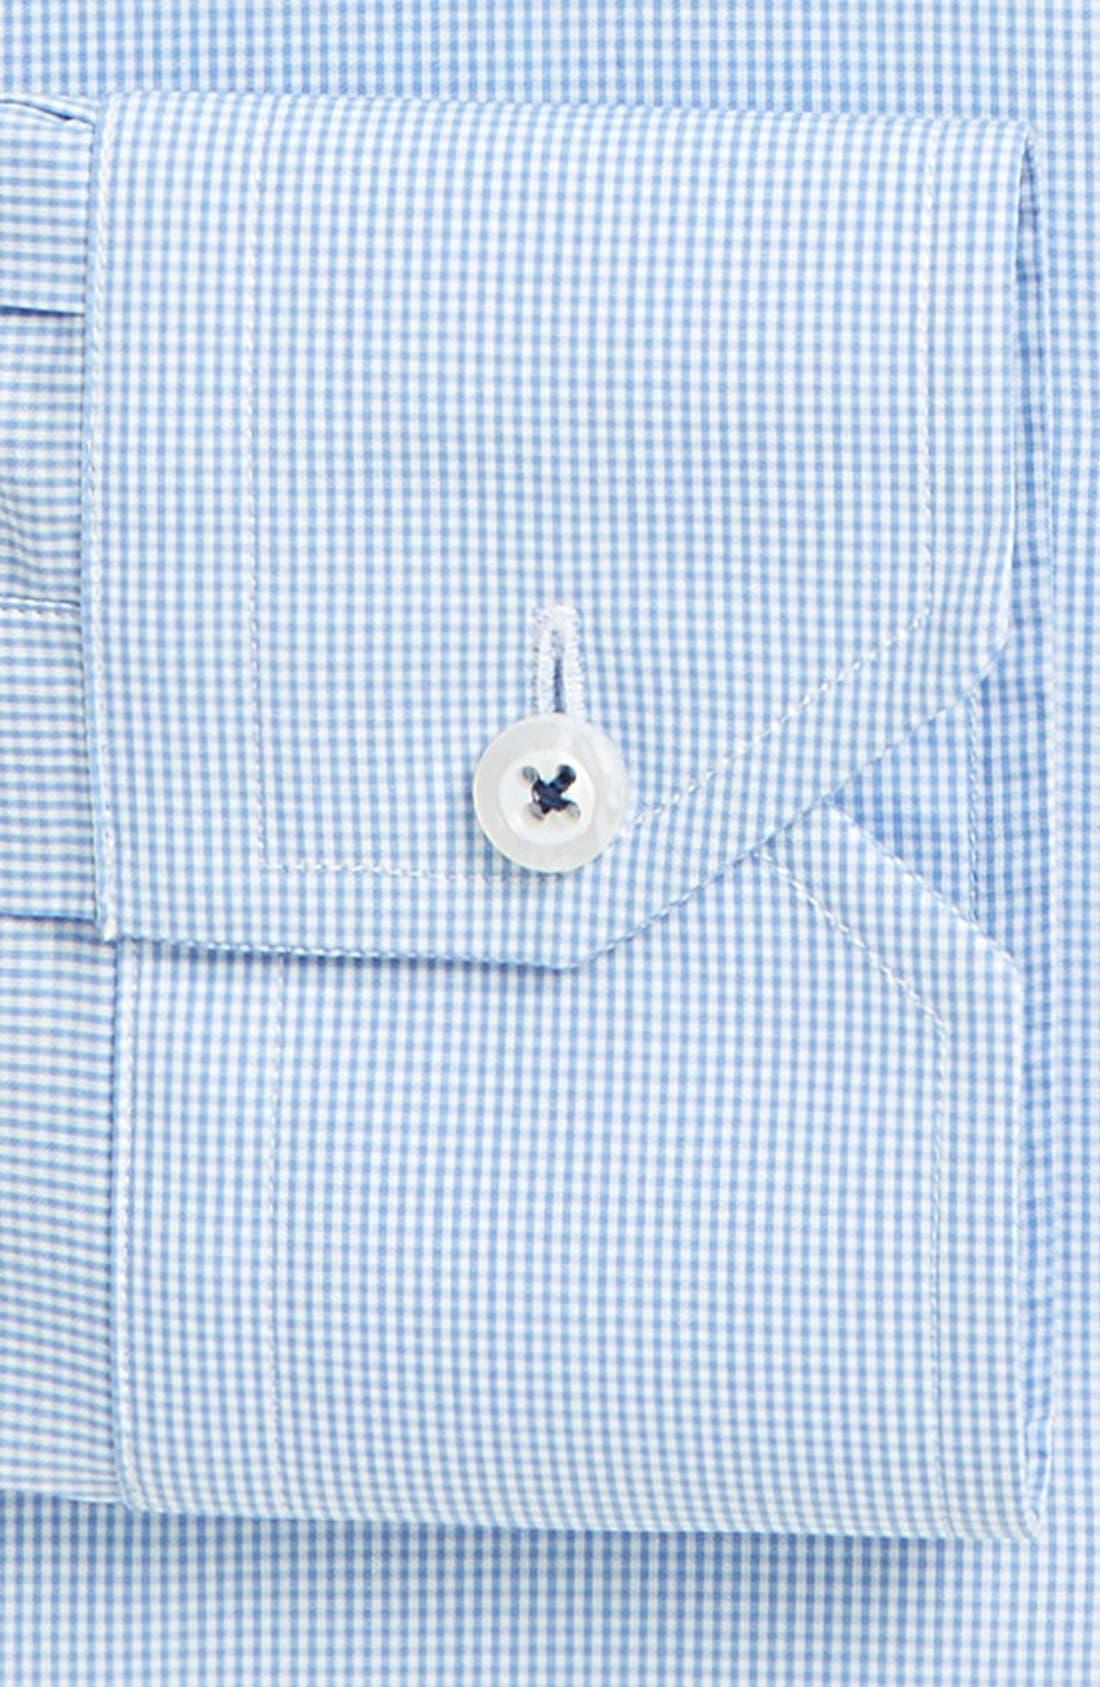 Classic Fit Micro Gingham Dress Shirt,                             Alternate thumbnail 2, color,                             492